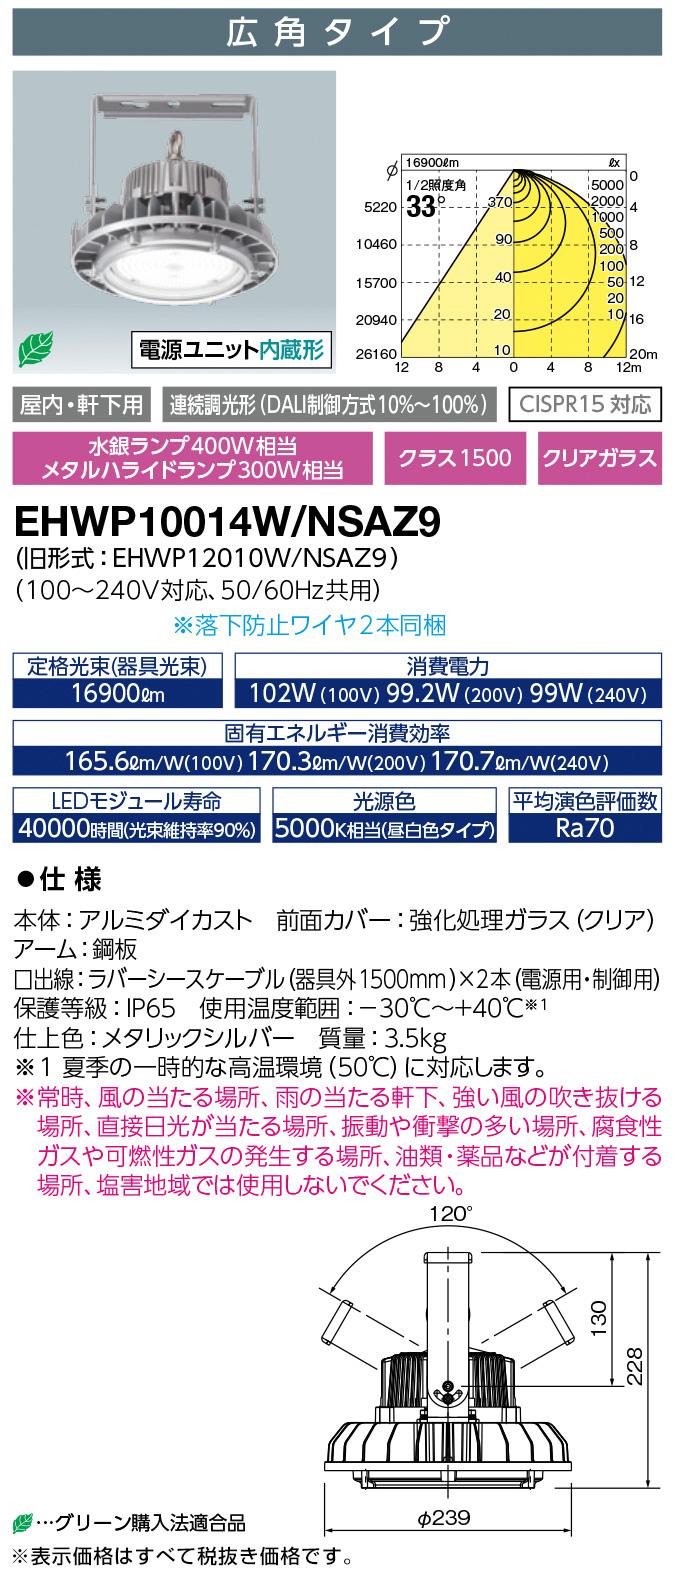 EHWP10014W/NSAZ9